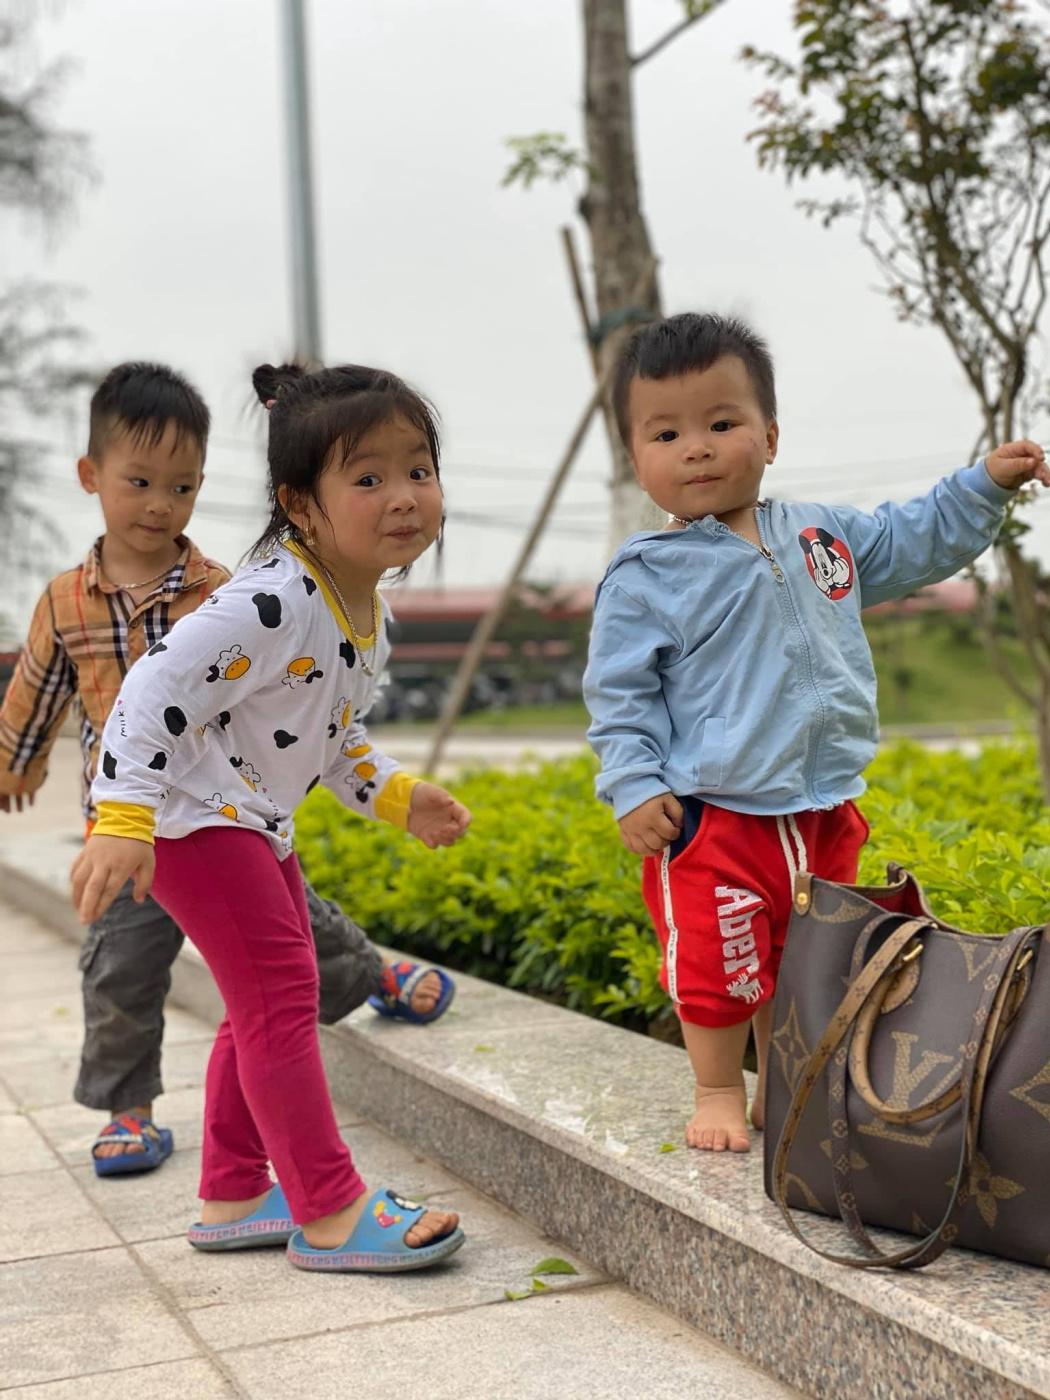 Khac Quang. Children play happily (2019)